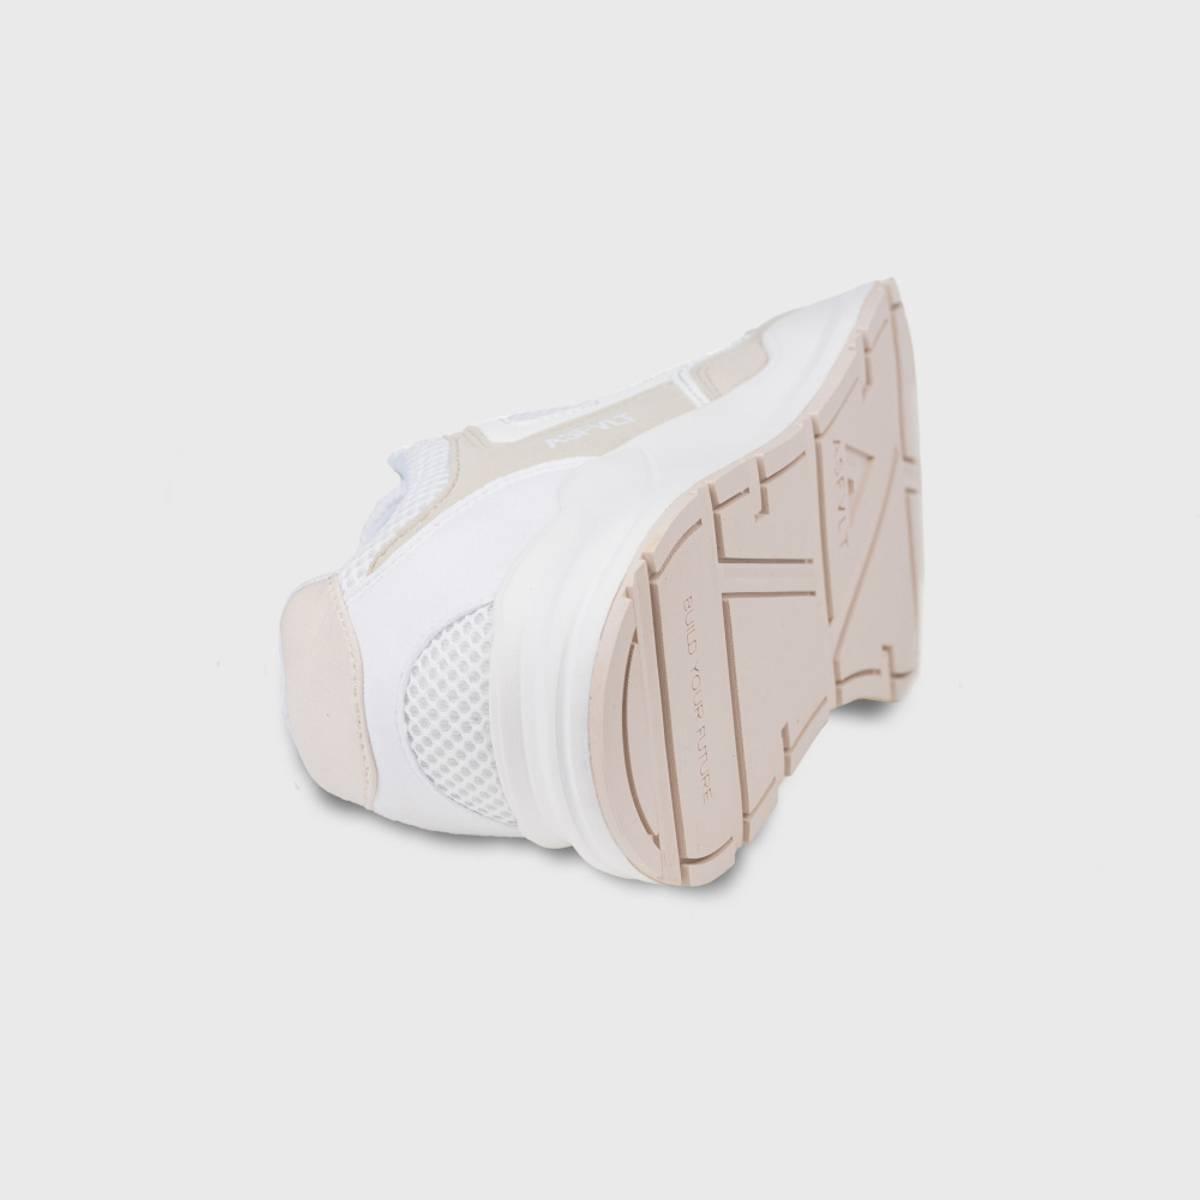 ASFVLT sneakers Concrete white sand